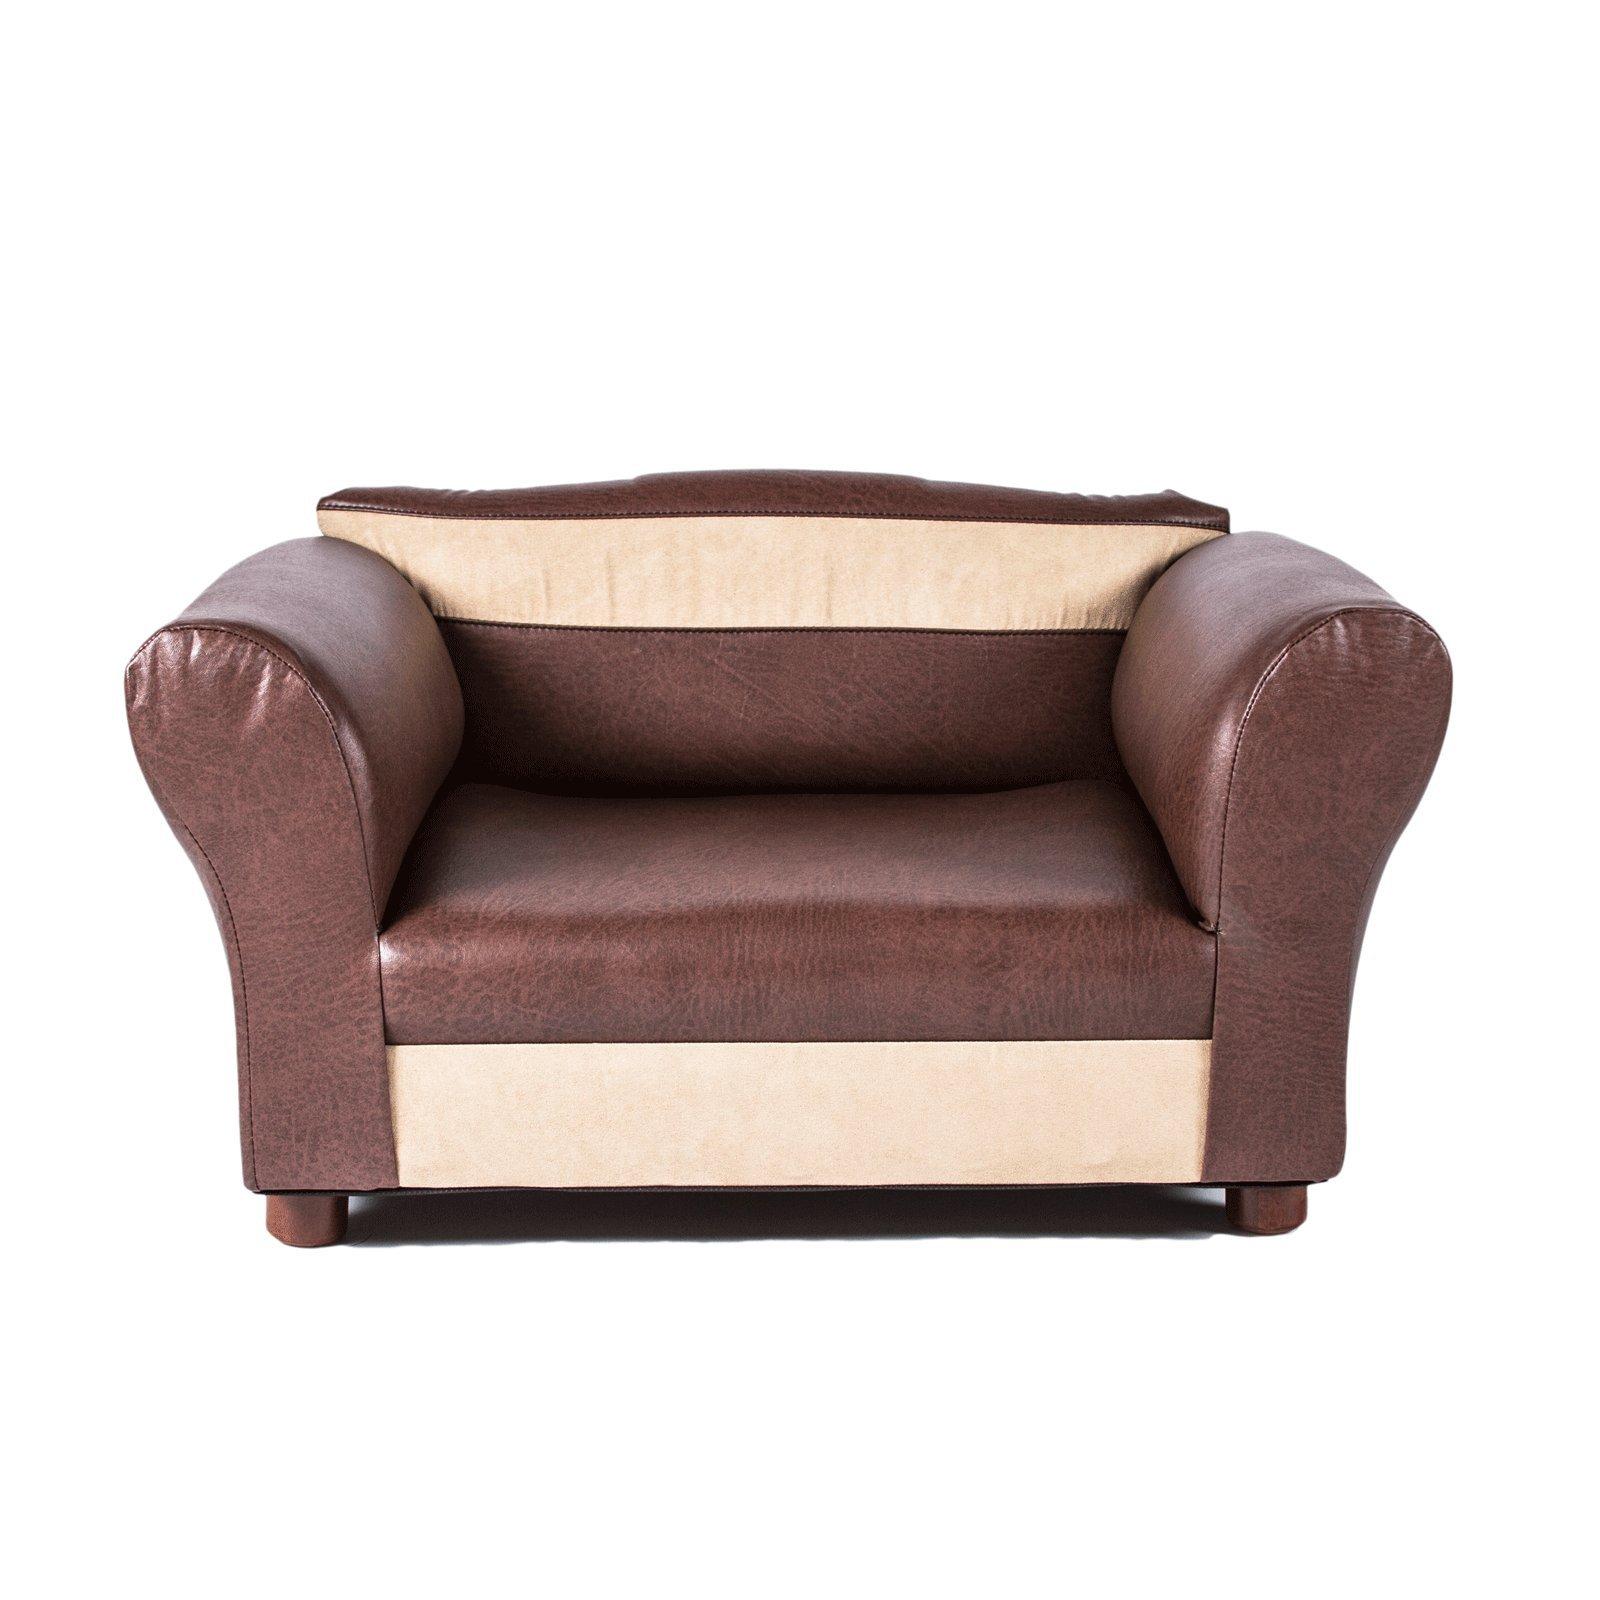 Mini Sofa Brown and Beige Pet Bed